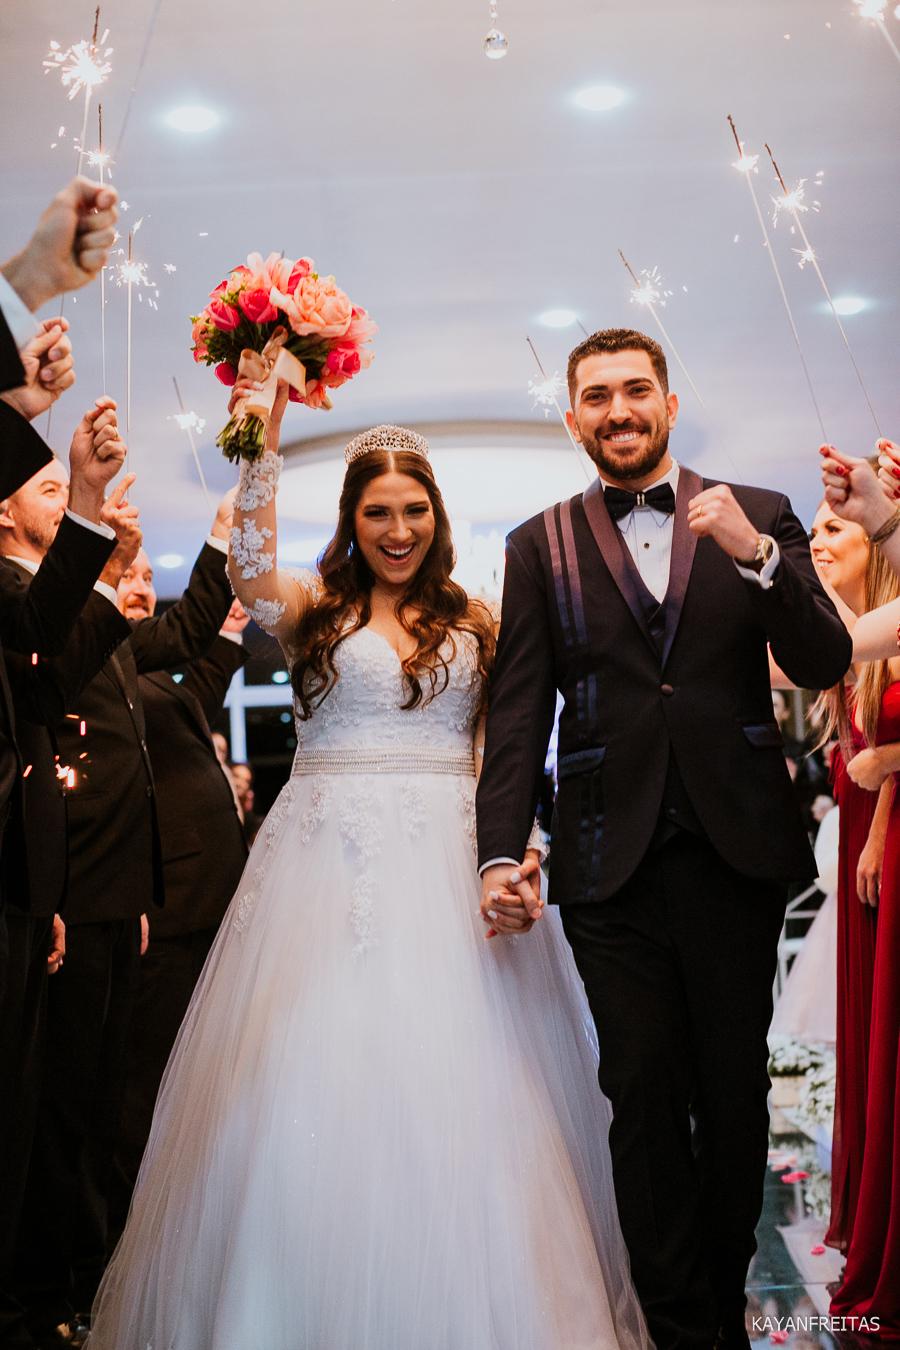 casamento-lic-florianopolis-ariane-diogo-0075 Casamento Ariane e Diogo - LIC Florianópolis